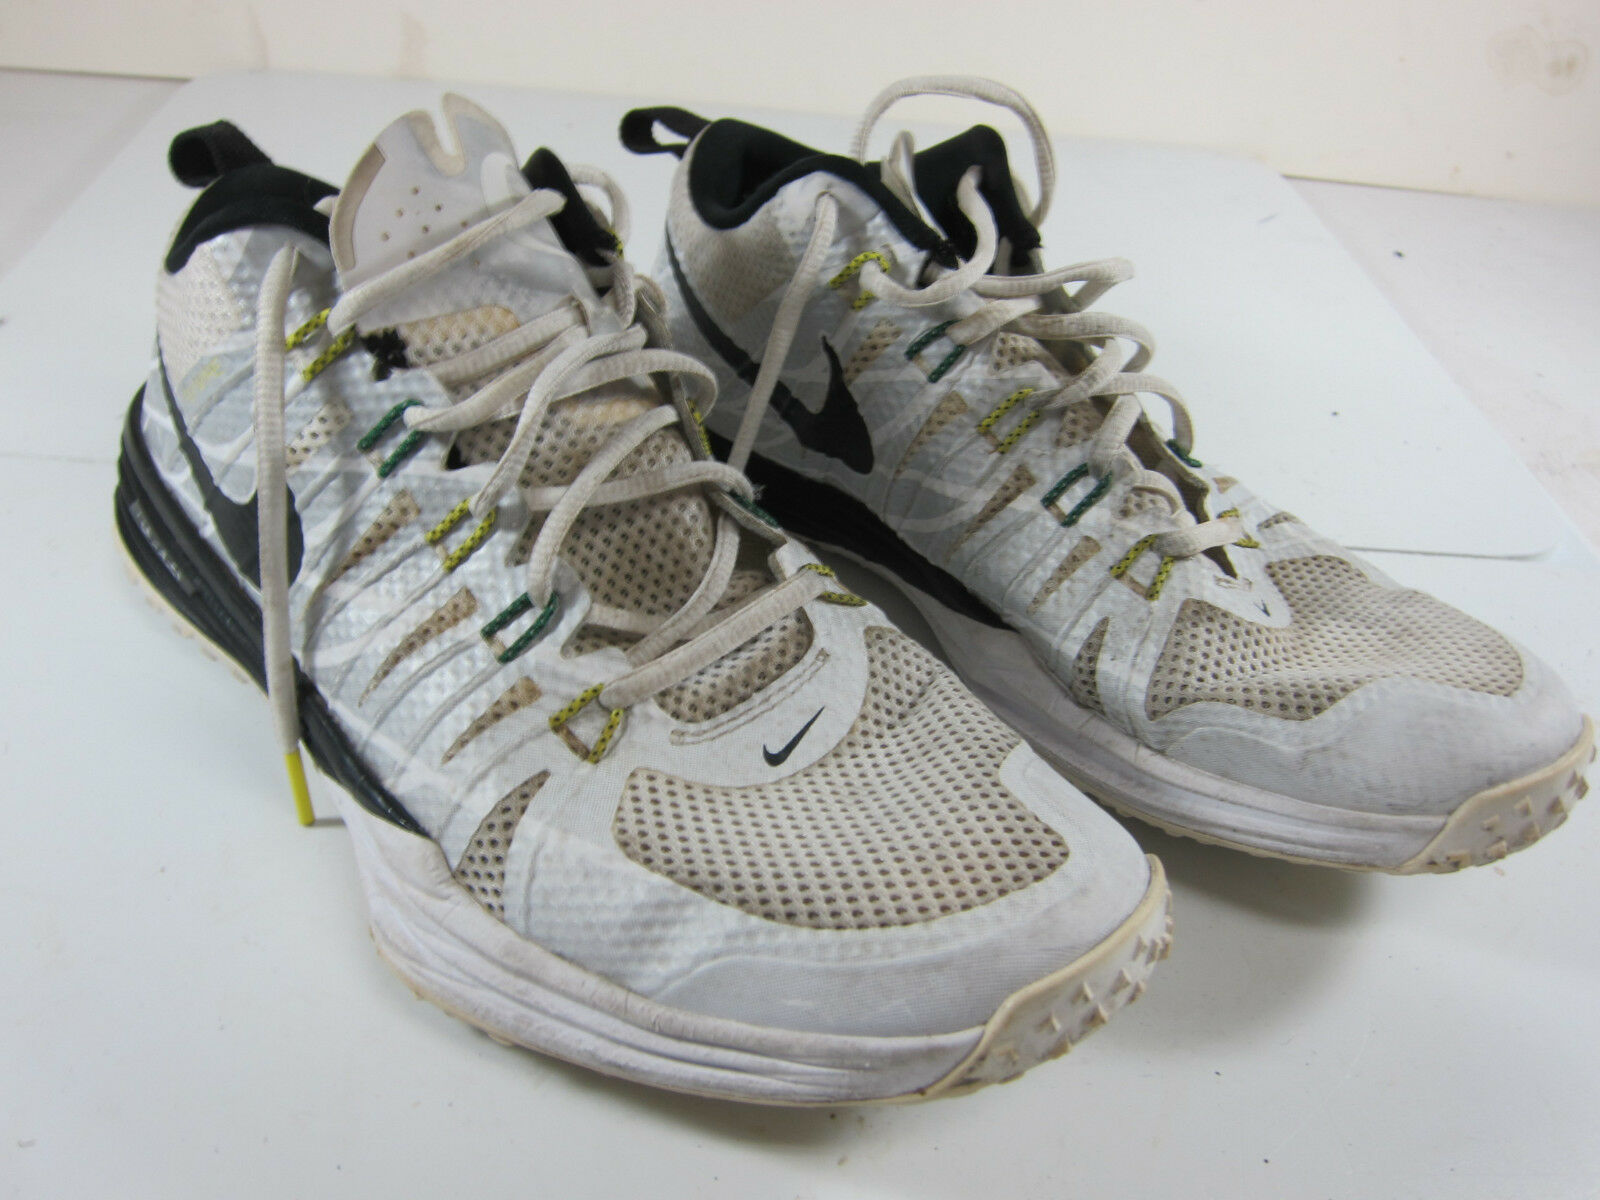 b3841a04b3fb Nike Men s Univ. Univ. Univ. Oregon Win the Day Size 10.5 Green White Black  Shoes 654283-001 9885e8